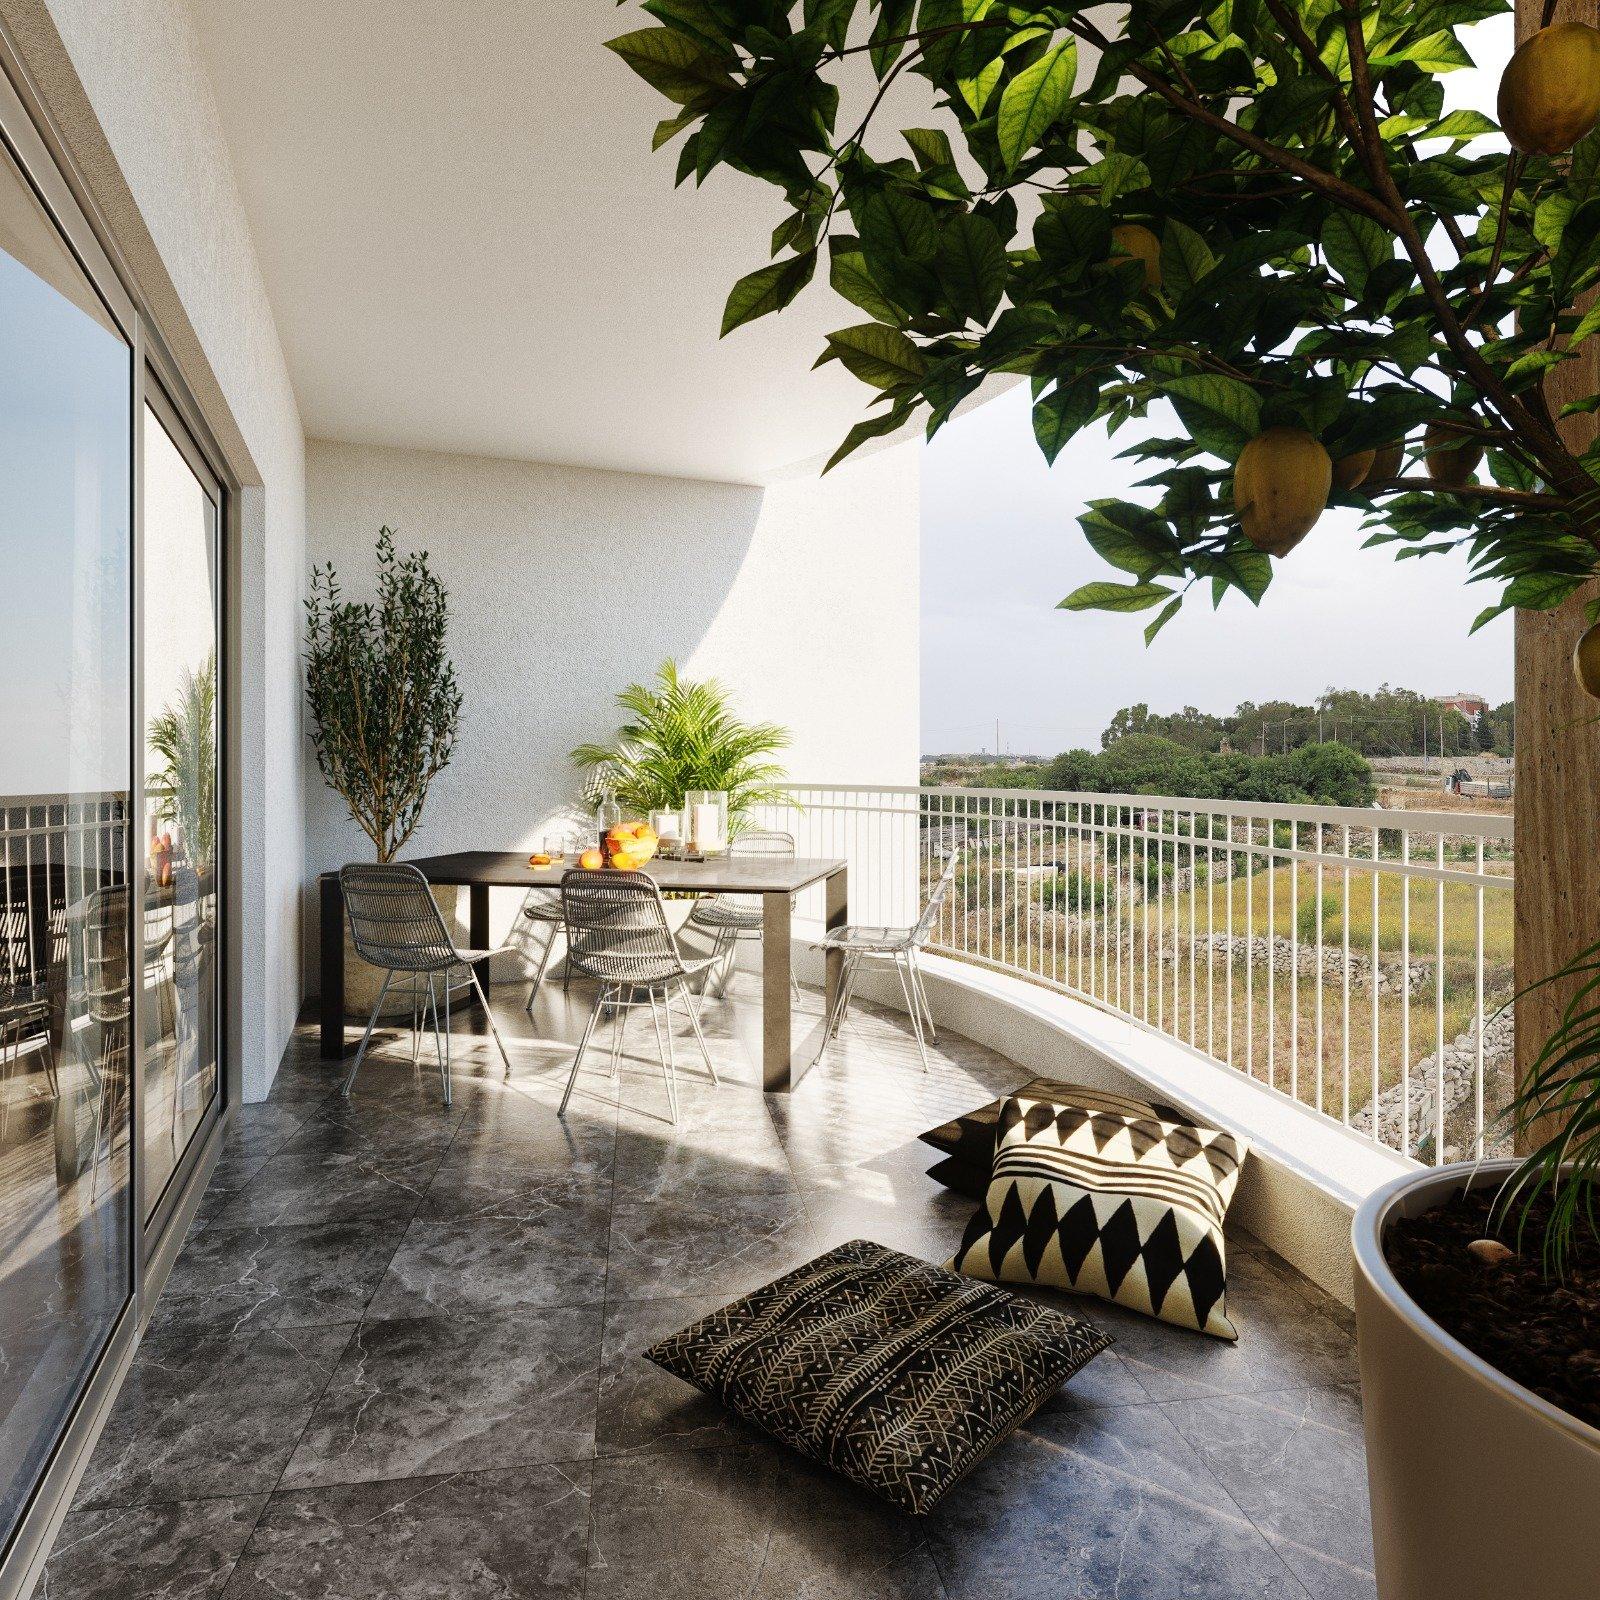 Ad Sale Apartment Mosta (MST) Ref:V1129MT